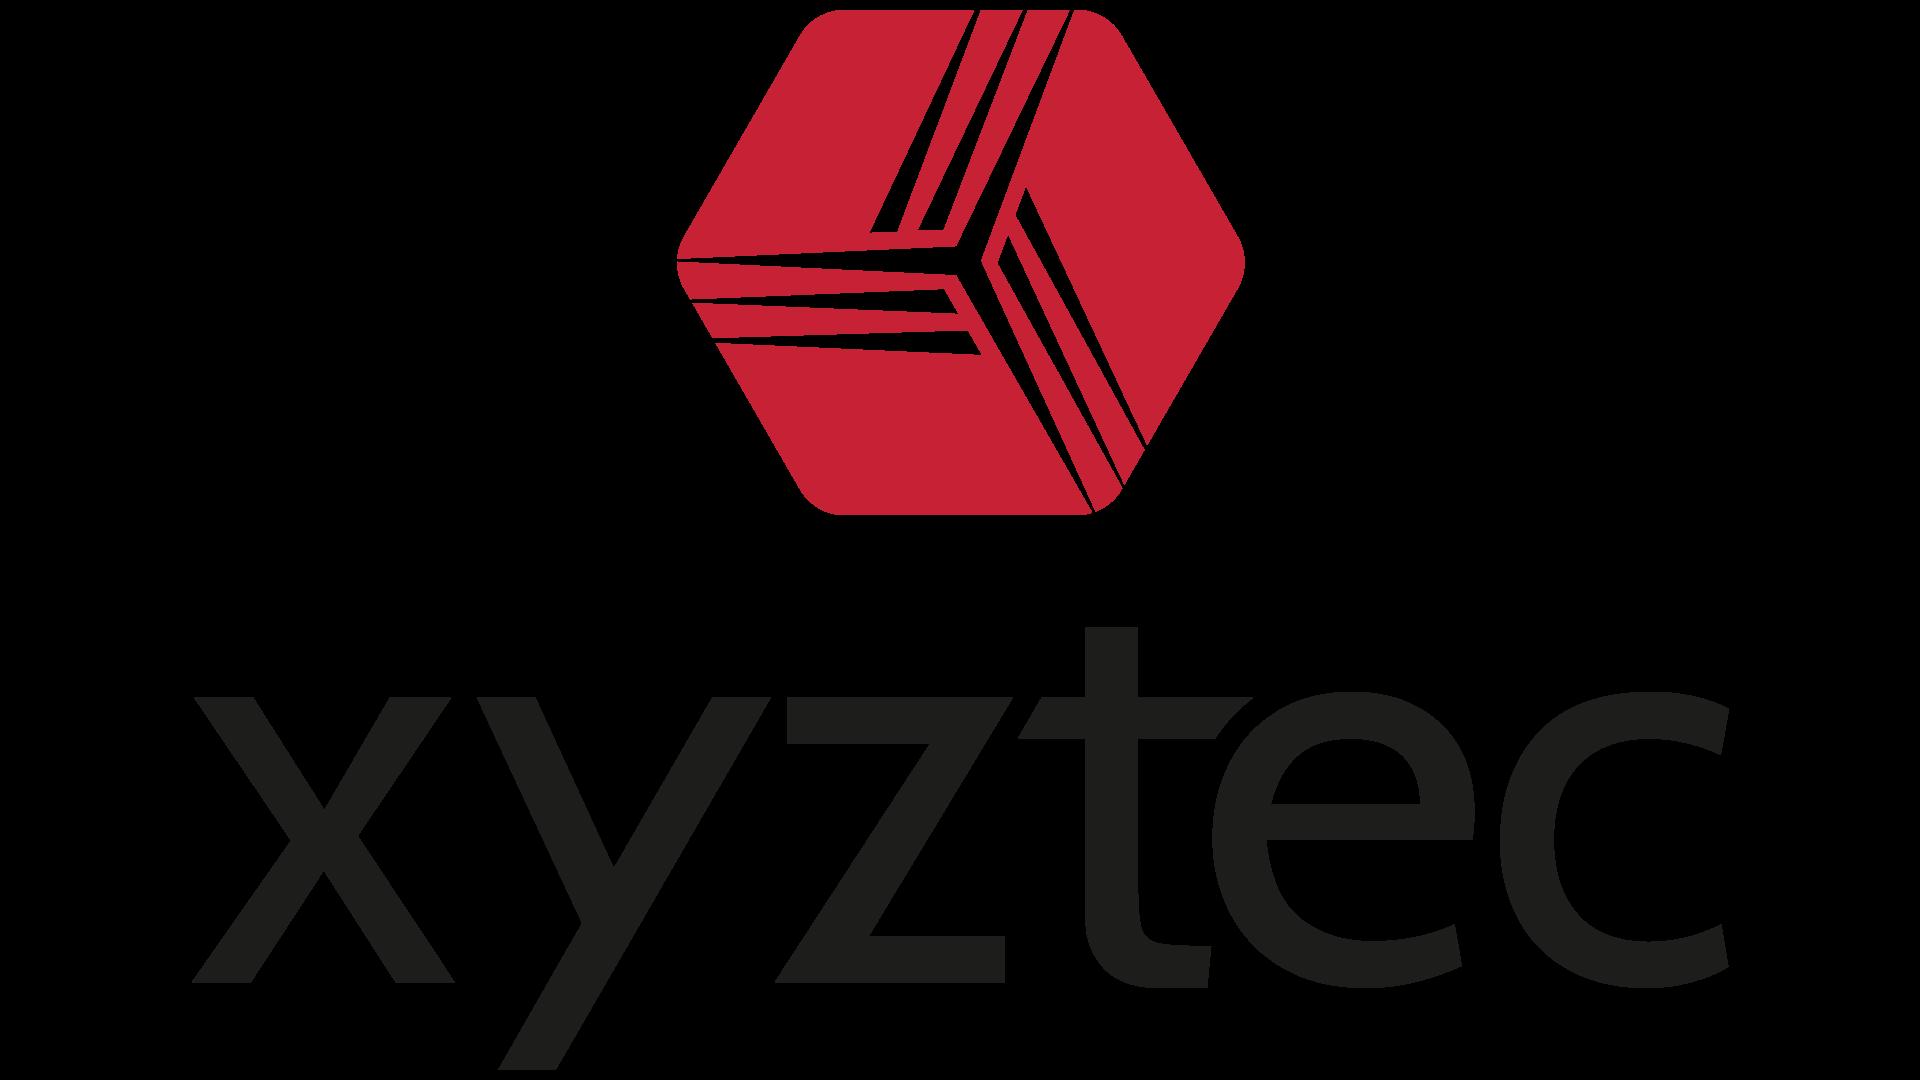 Xyztec logo vertical